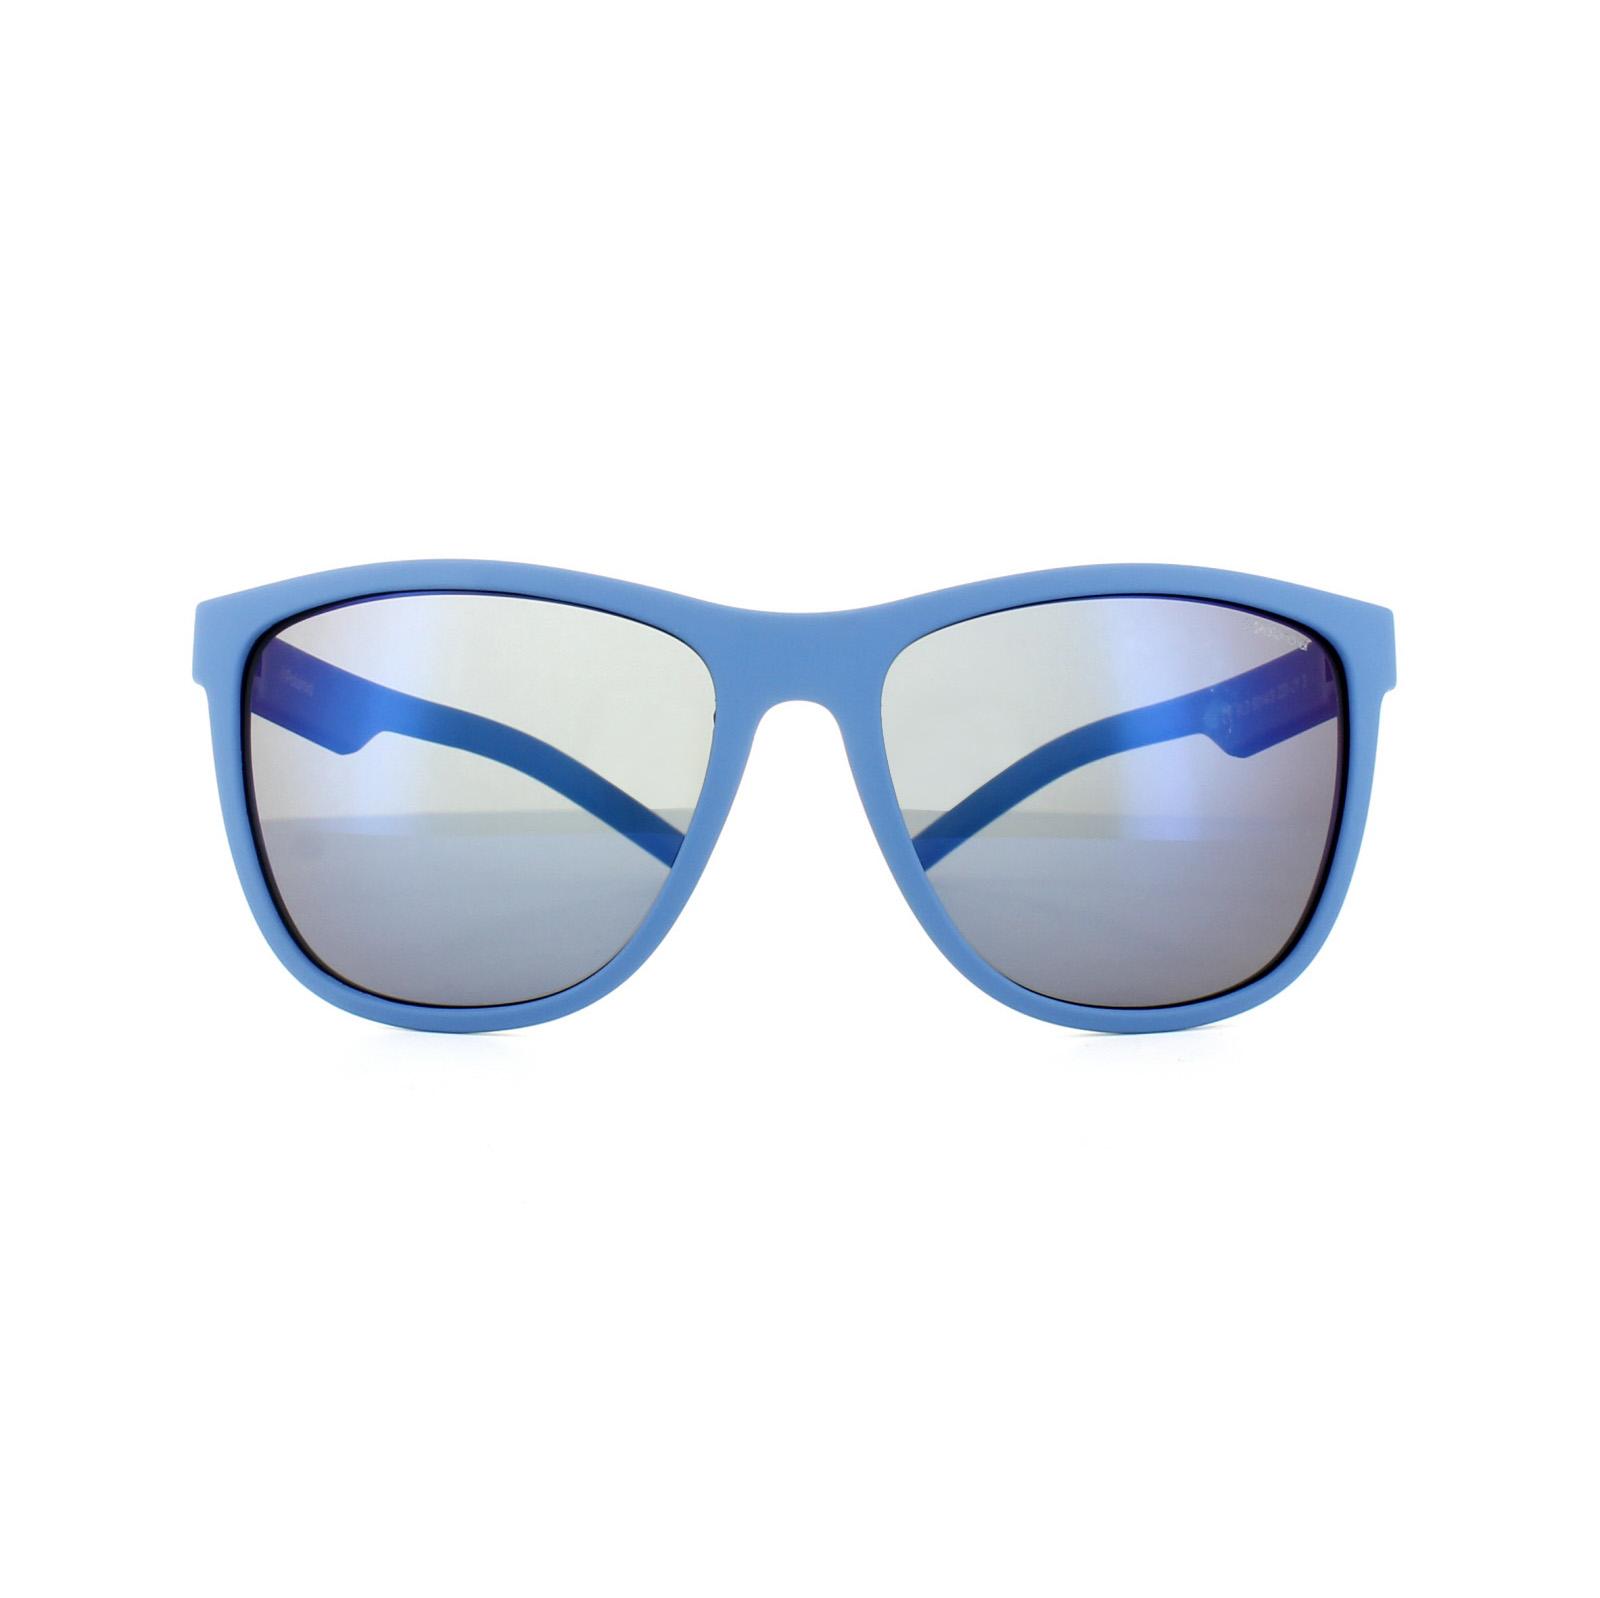 6650bb1333 CENTINELA Polaroid gafas de sol Sport PLD 6014/S JY pared espejo azul gris  azul polarizado